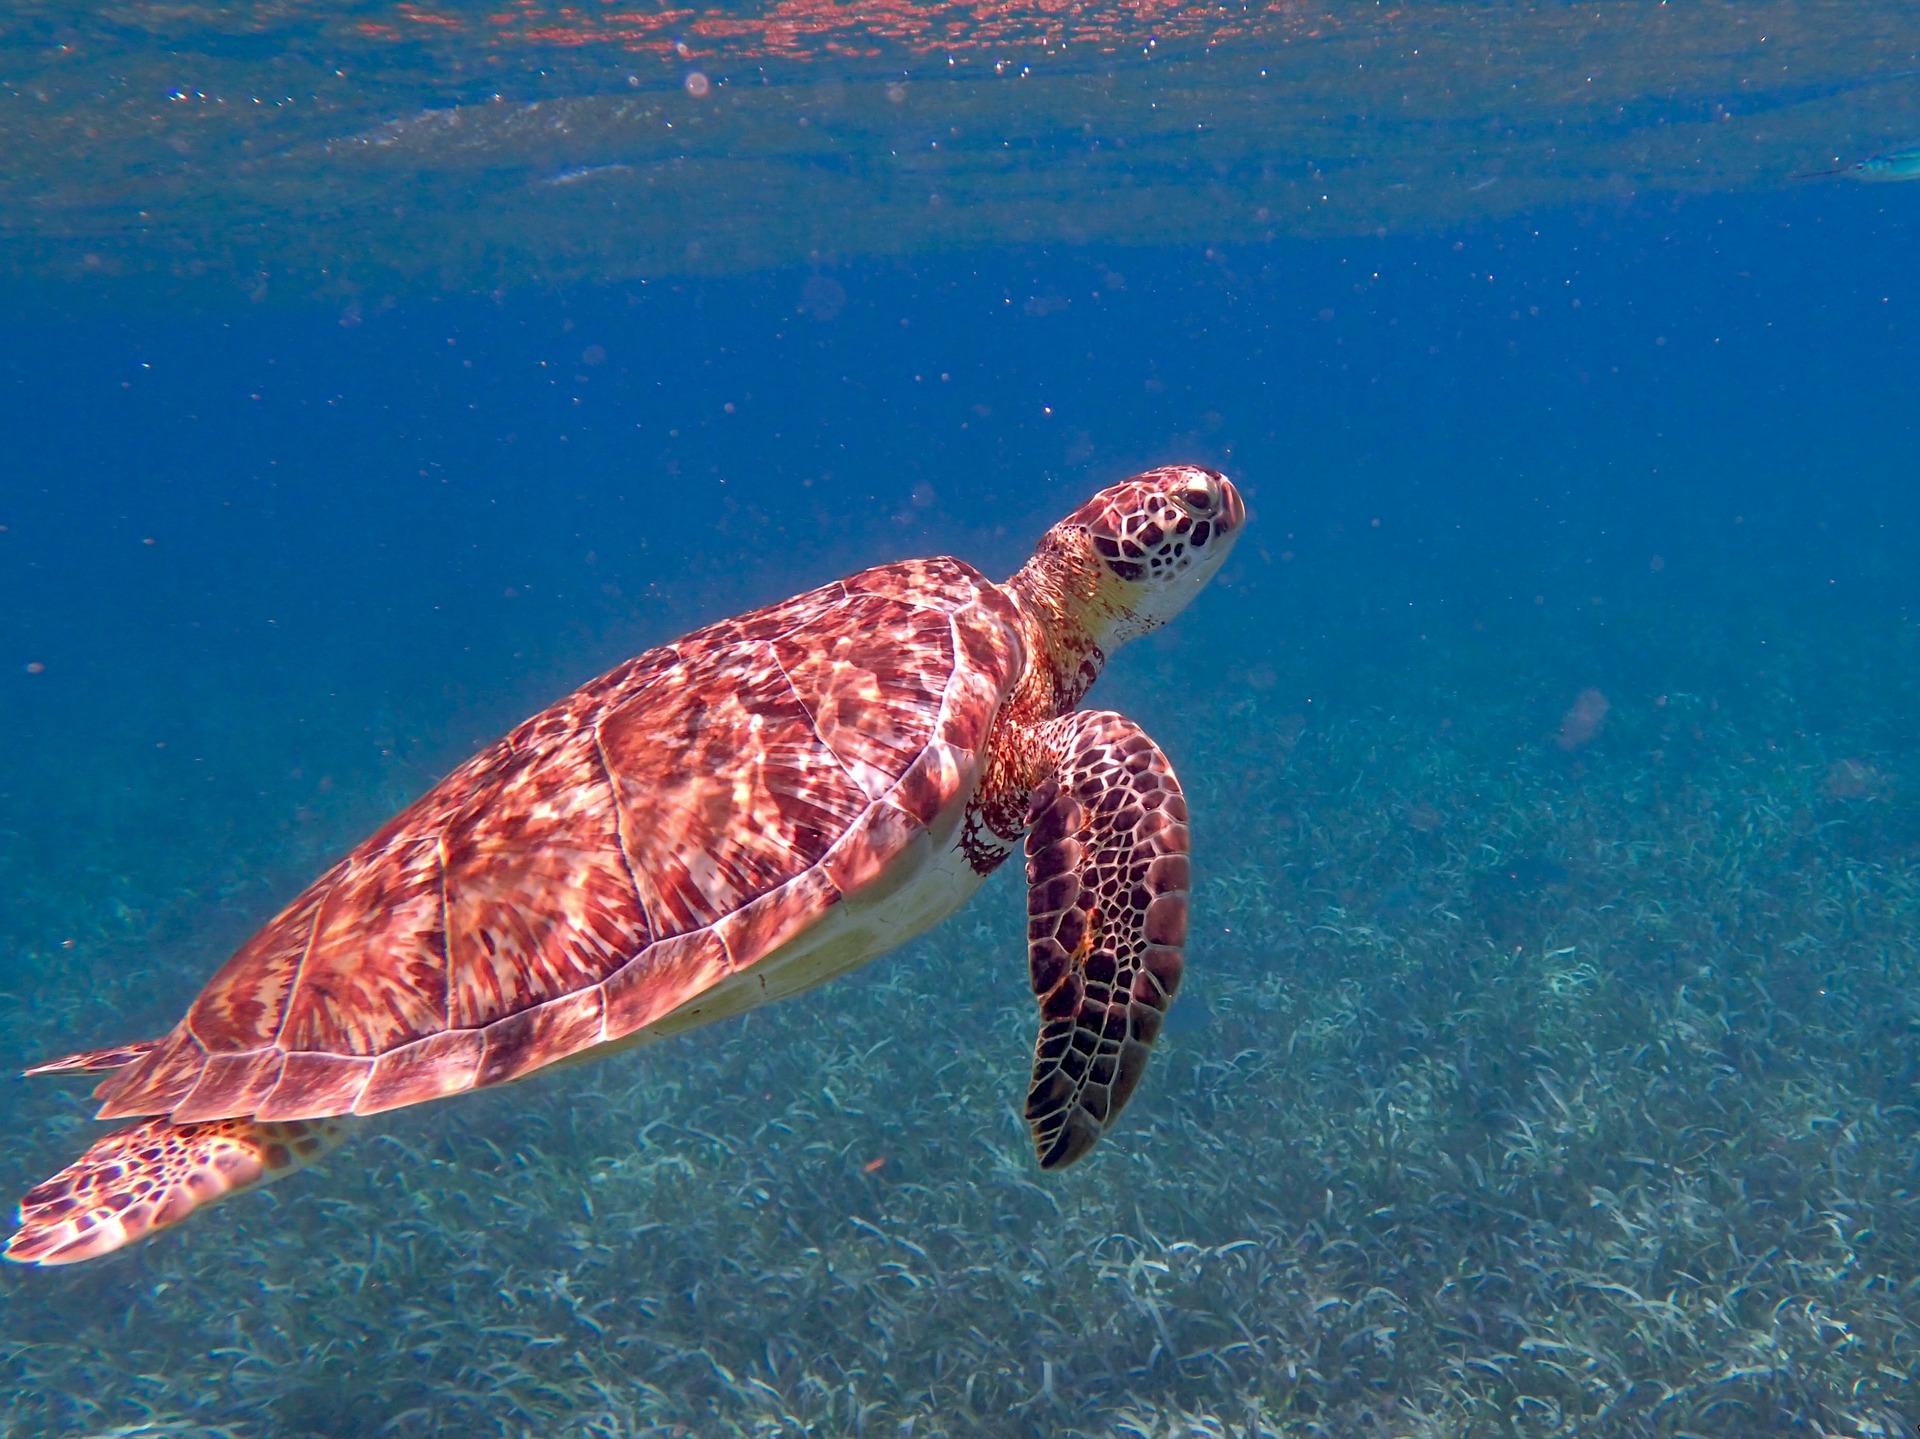 Snorkelling in Belize